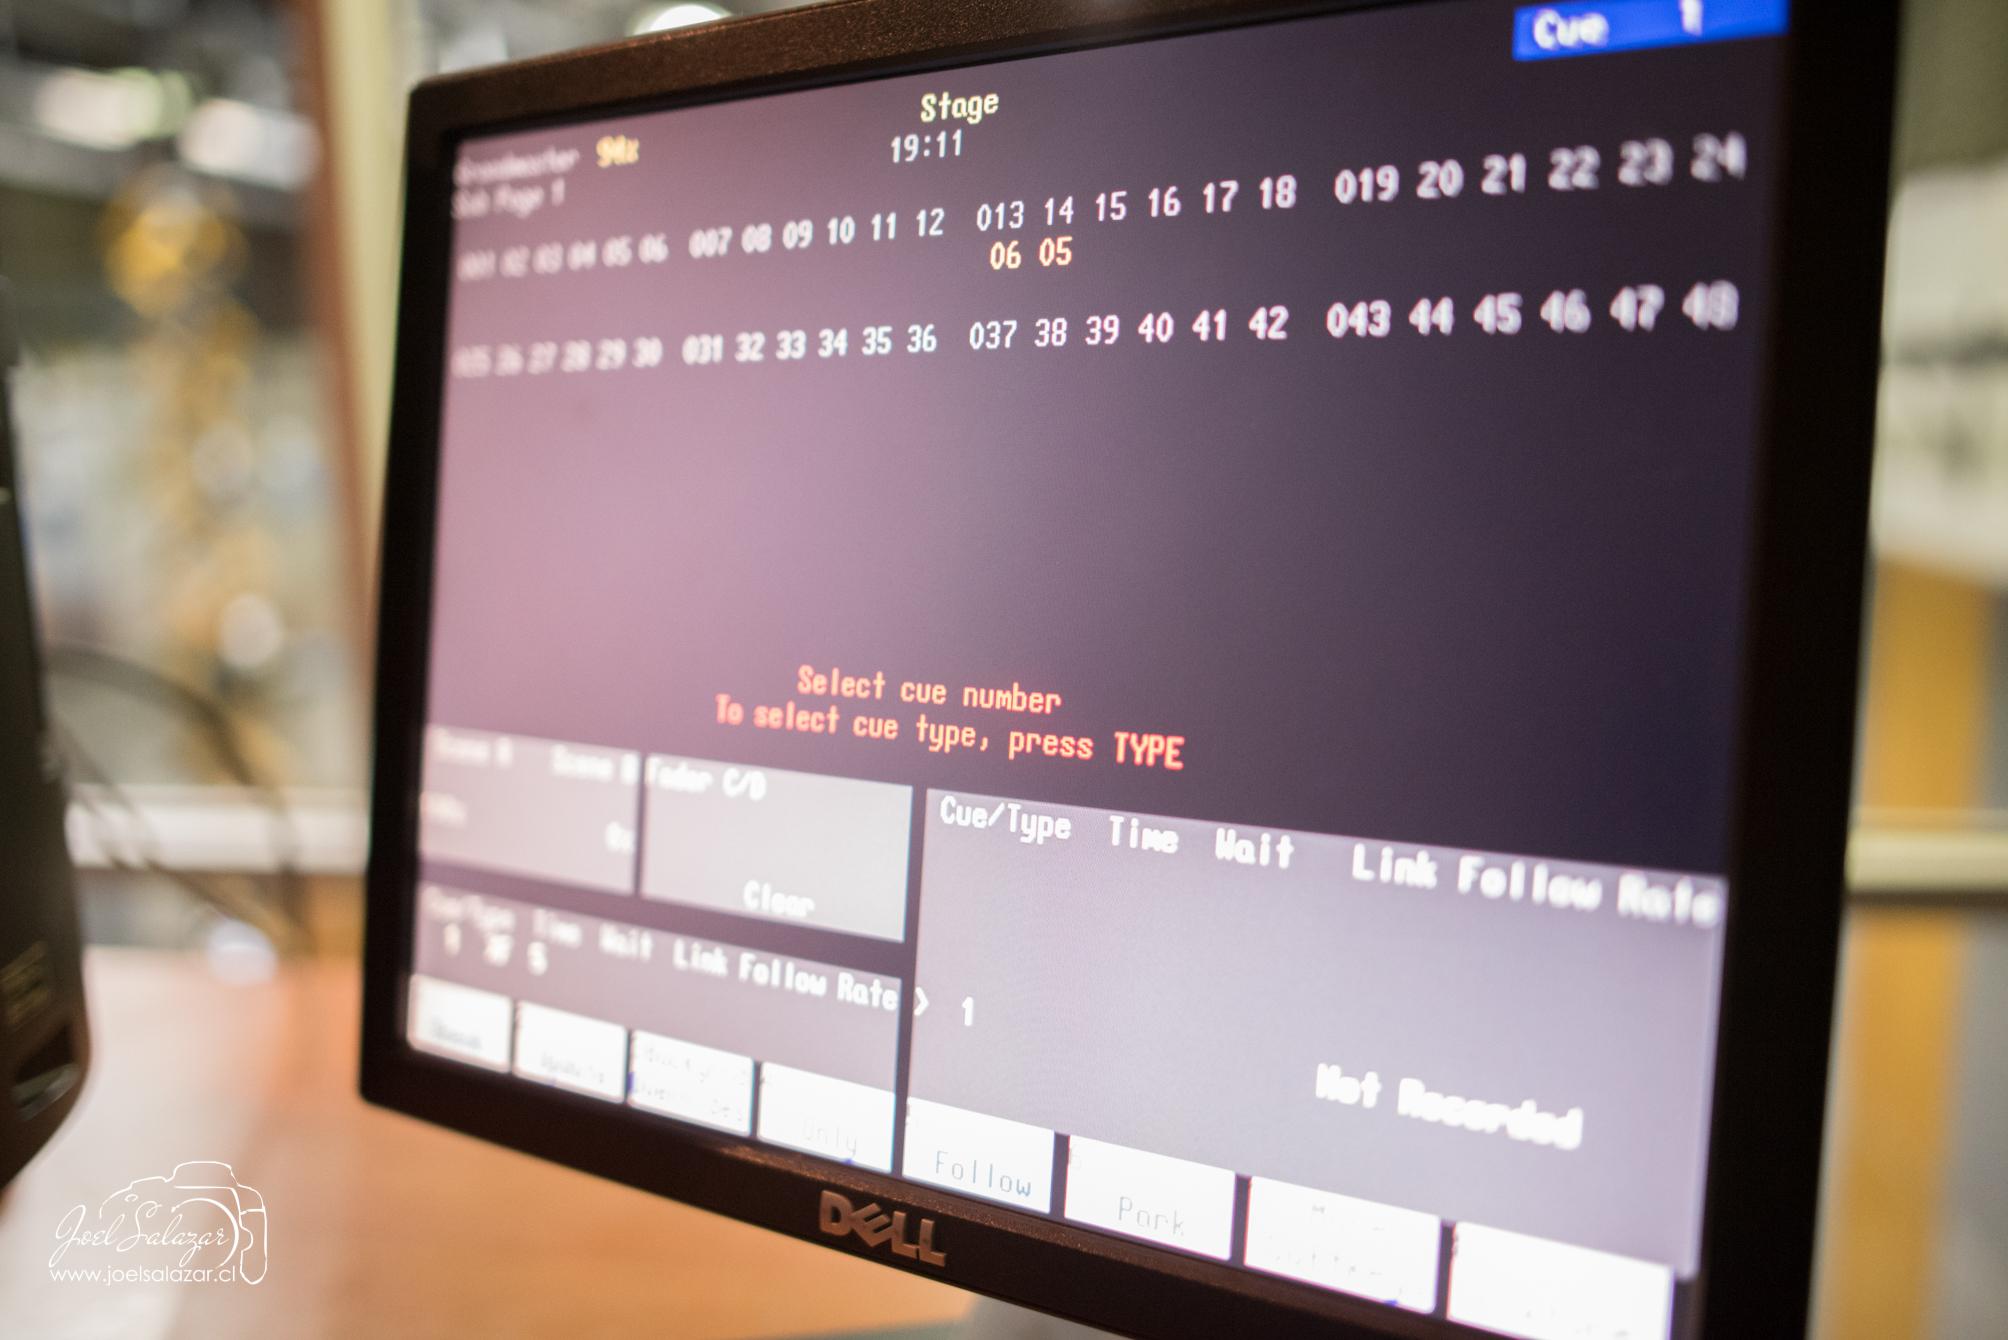 Capacitación DMX-13